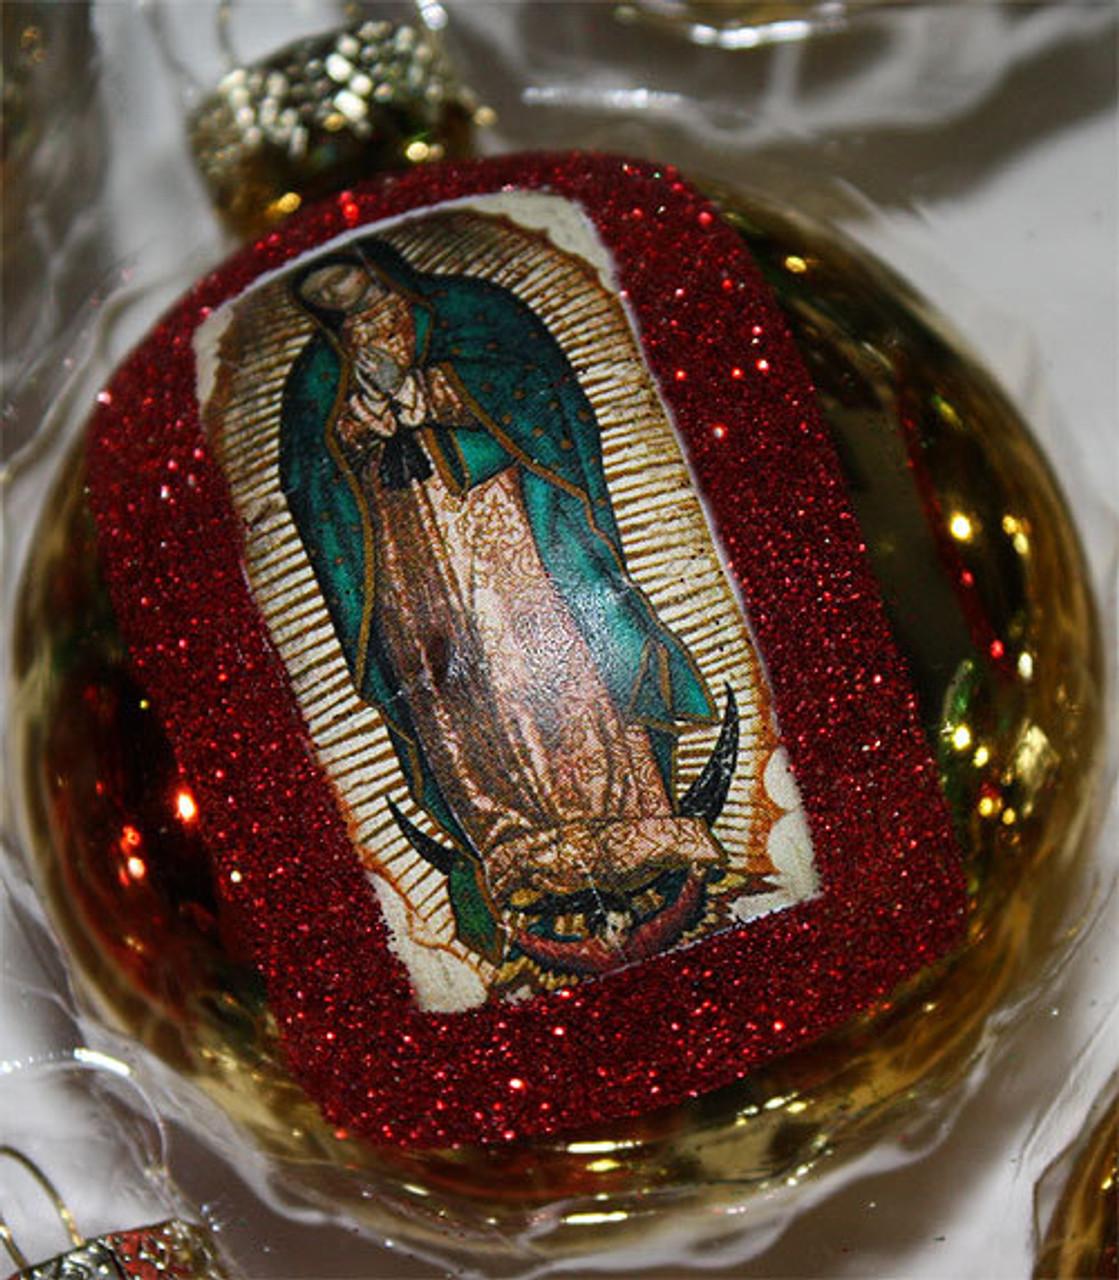 Mexican Christmas Decorations.La Virgen De Guadalupe Mexican Christmas Decorations